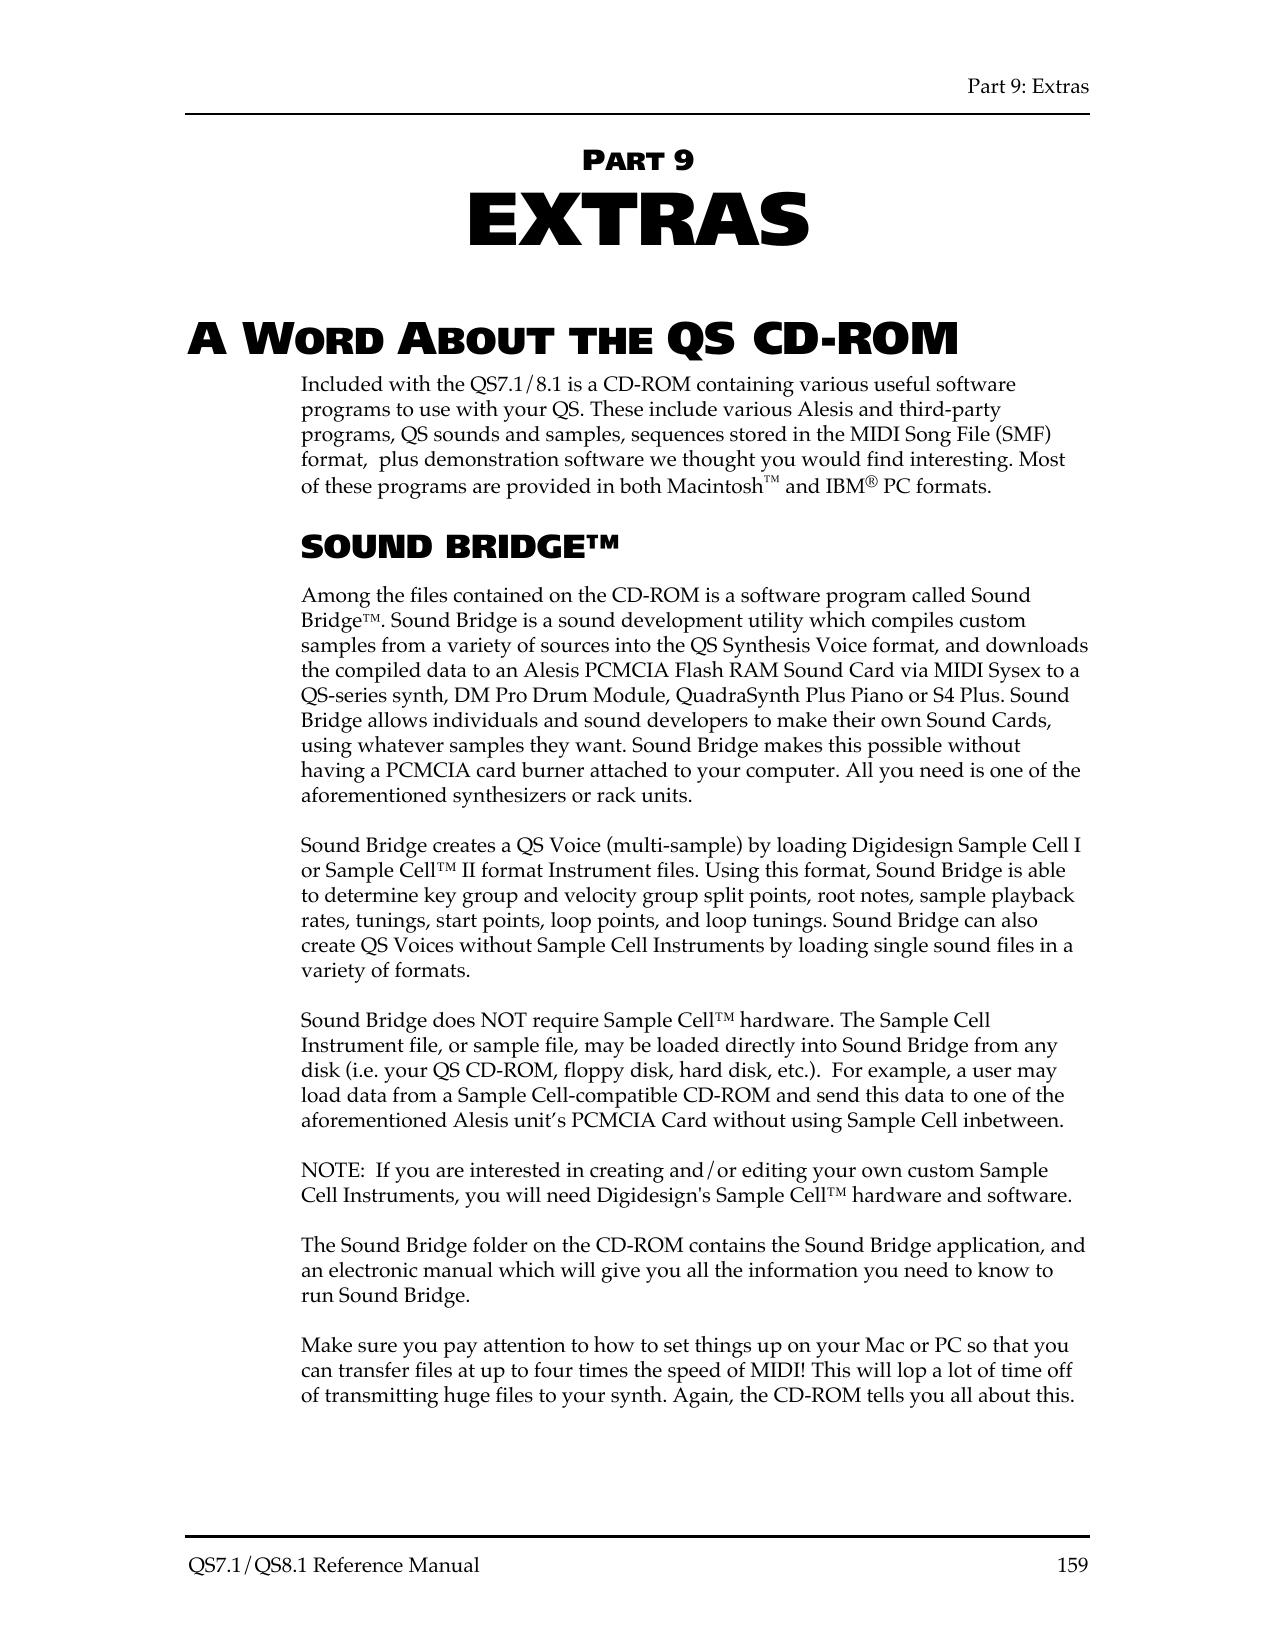 EXTRAS - Vintage Synth manuals | manualzz com